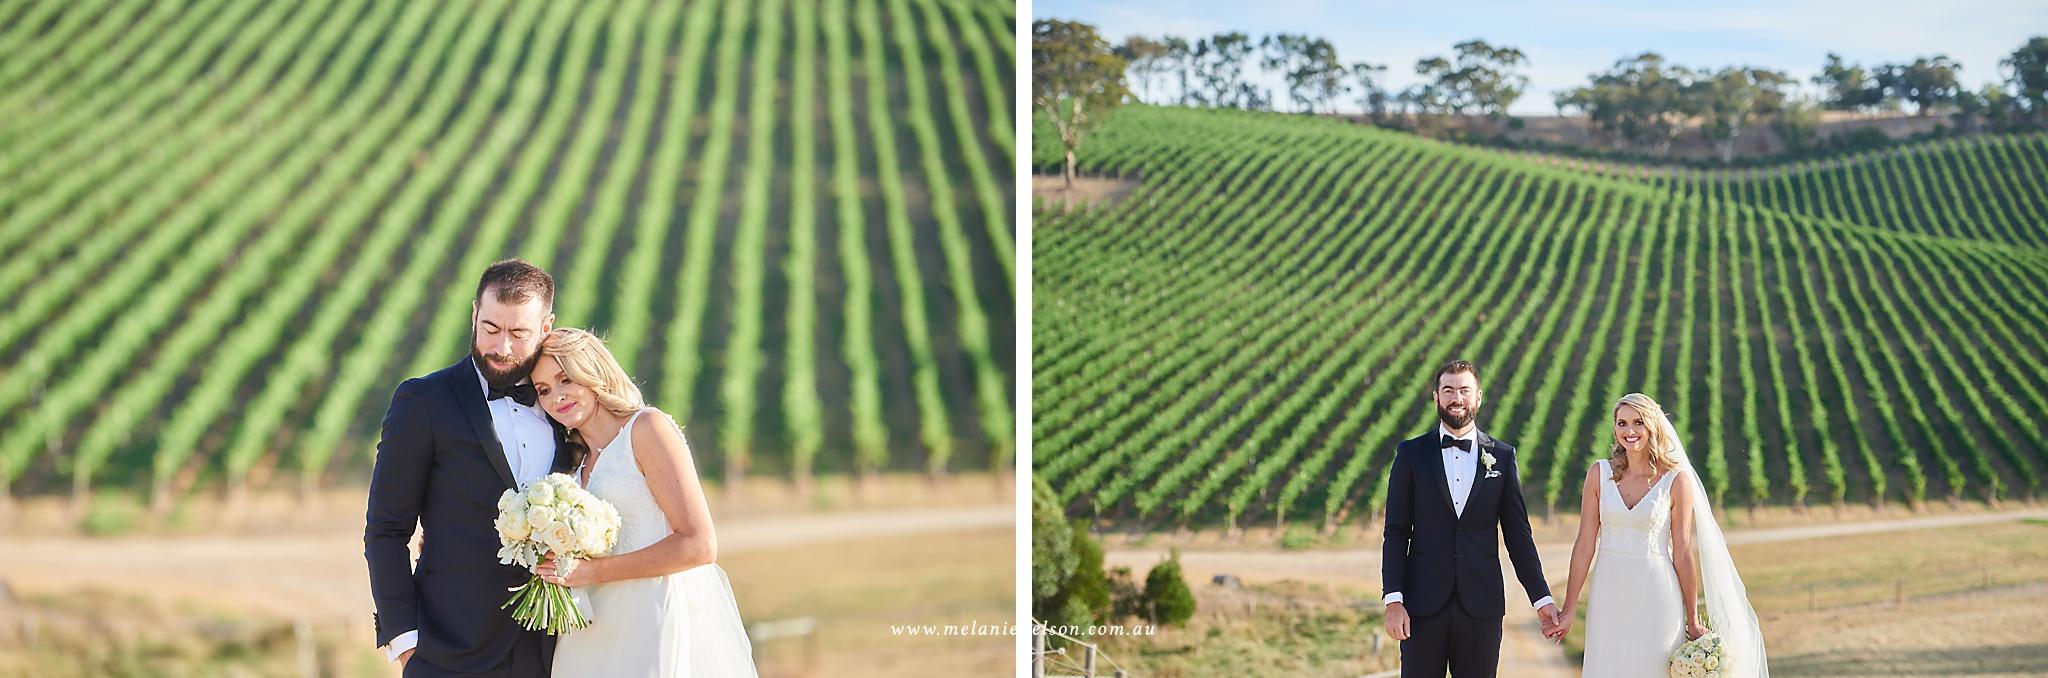 longview_vineyard_wedding_0061.jpg